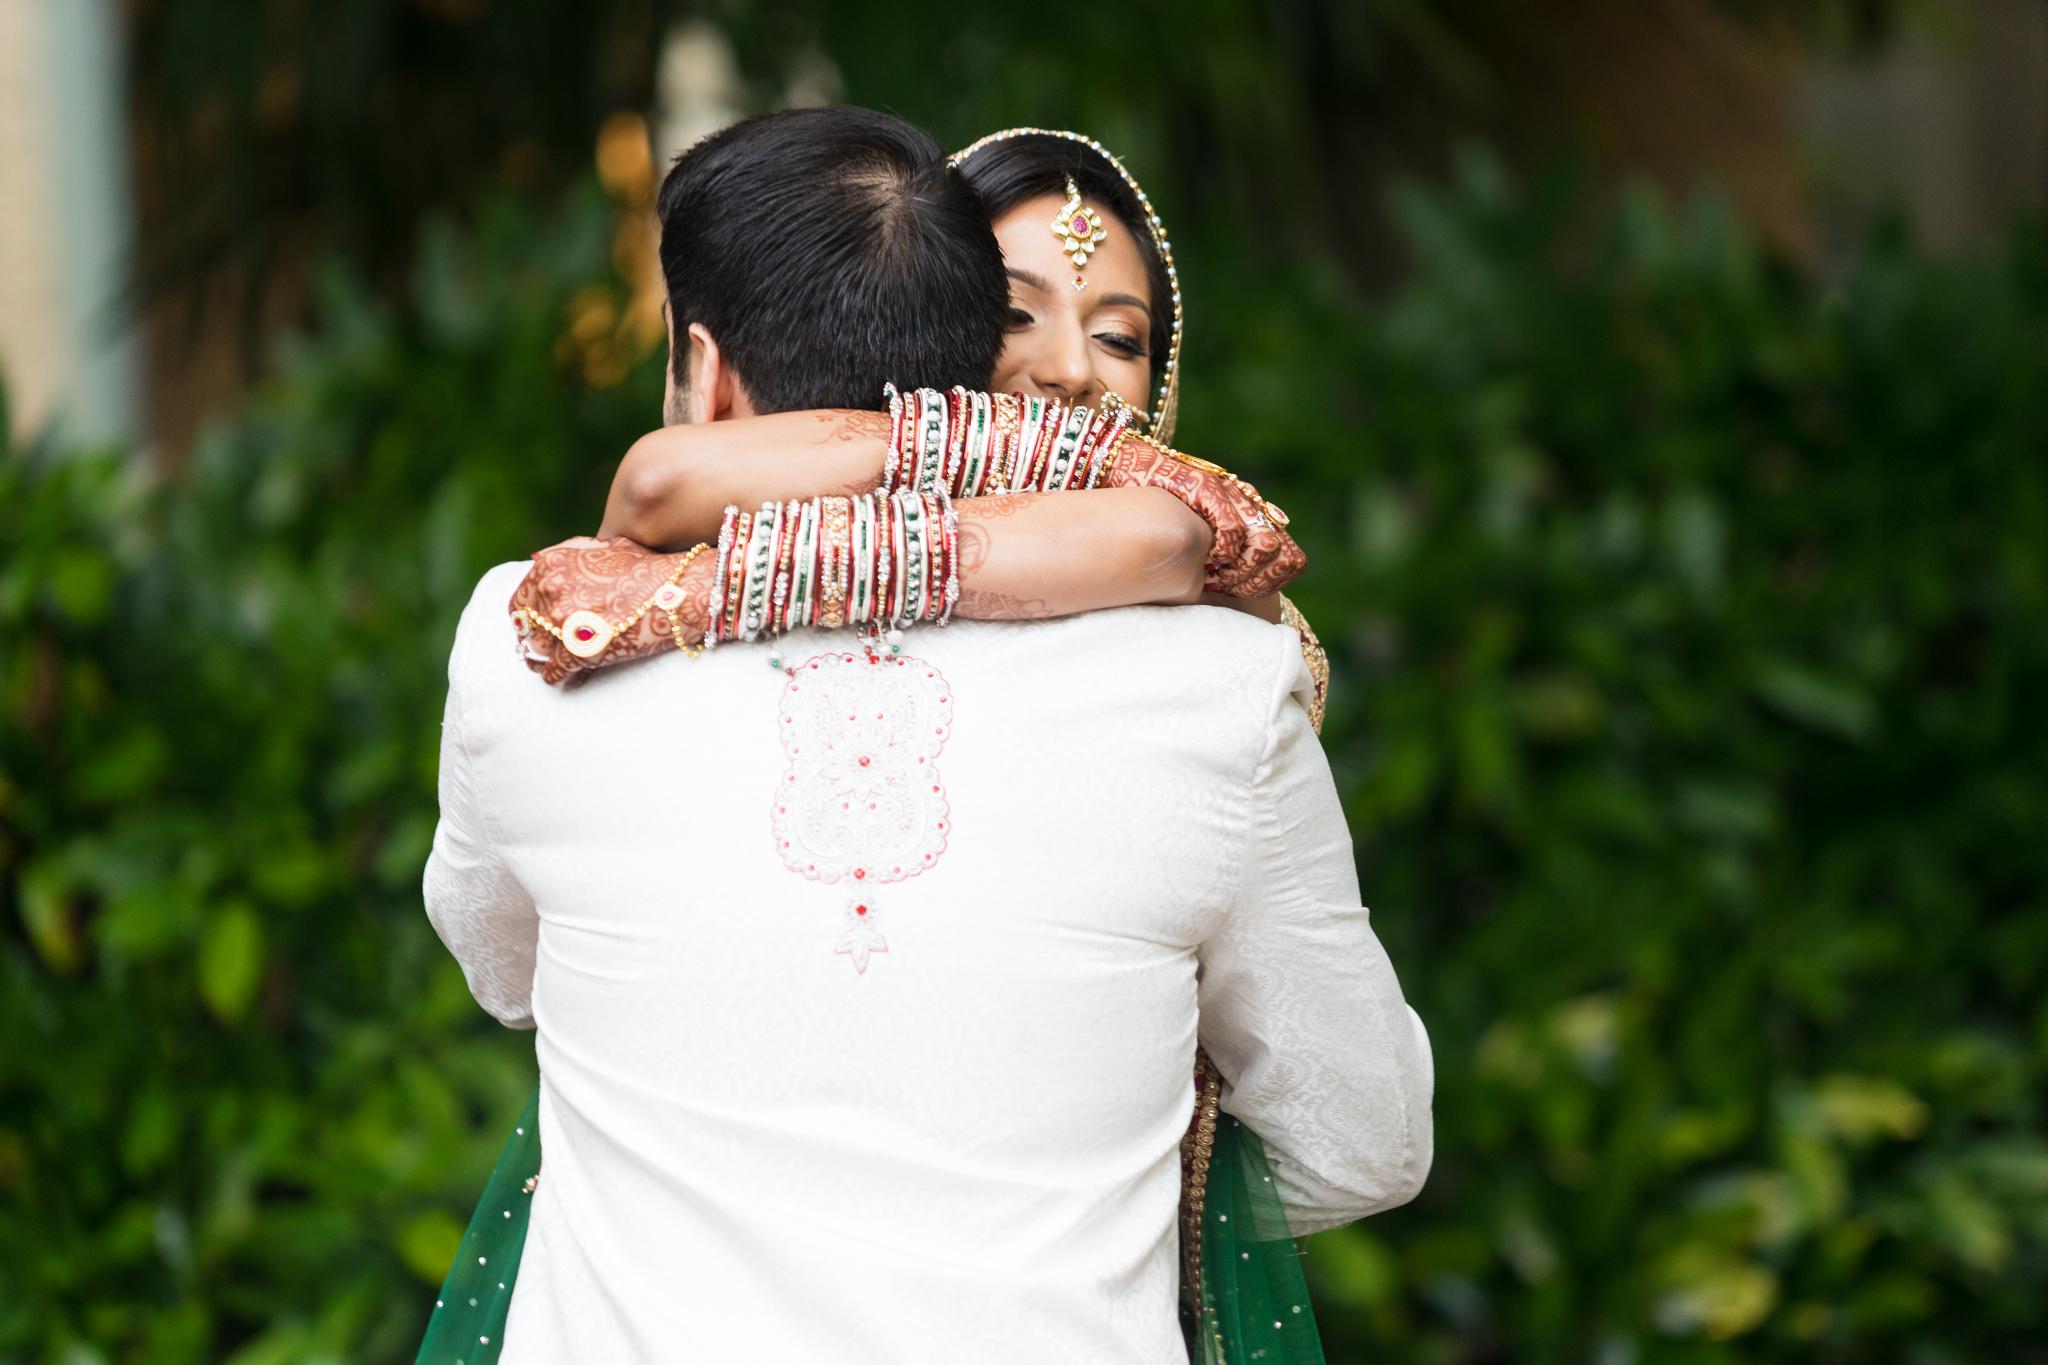 ReeyaAman-Wedding-Photography-www.MnMfoto.comMnMfoto-Krishna-Sajan-786.jpg